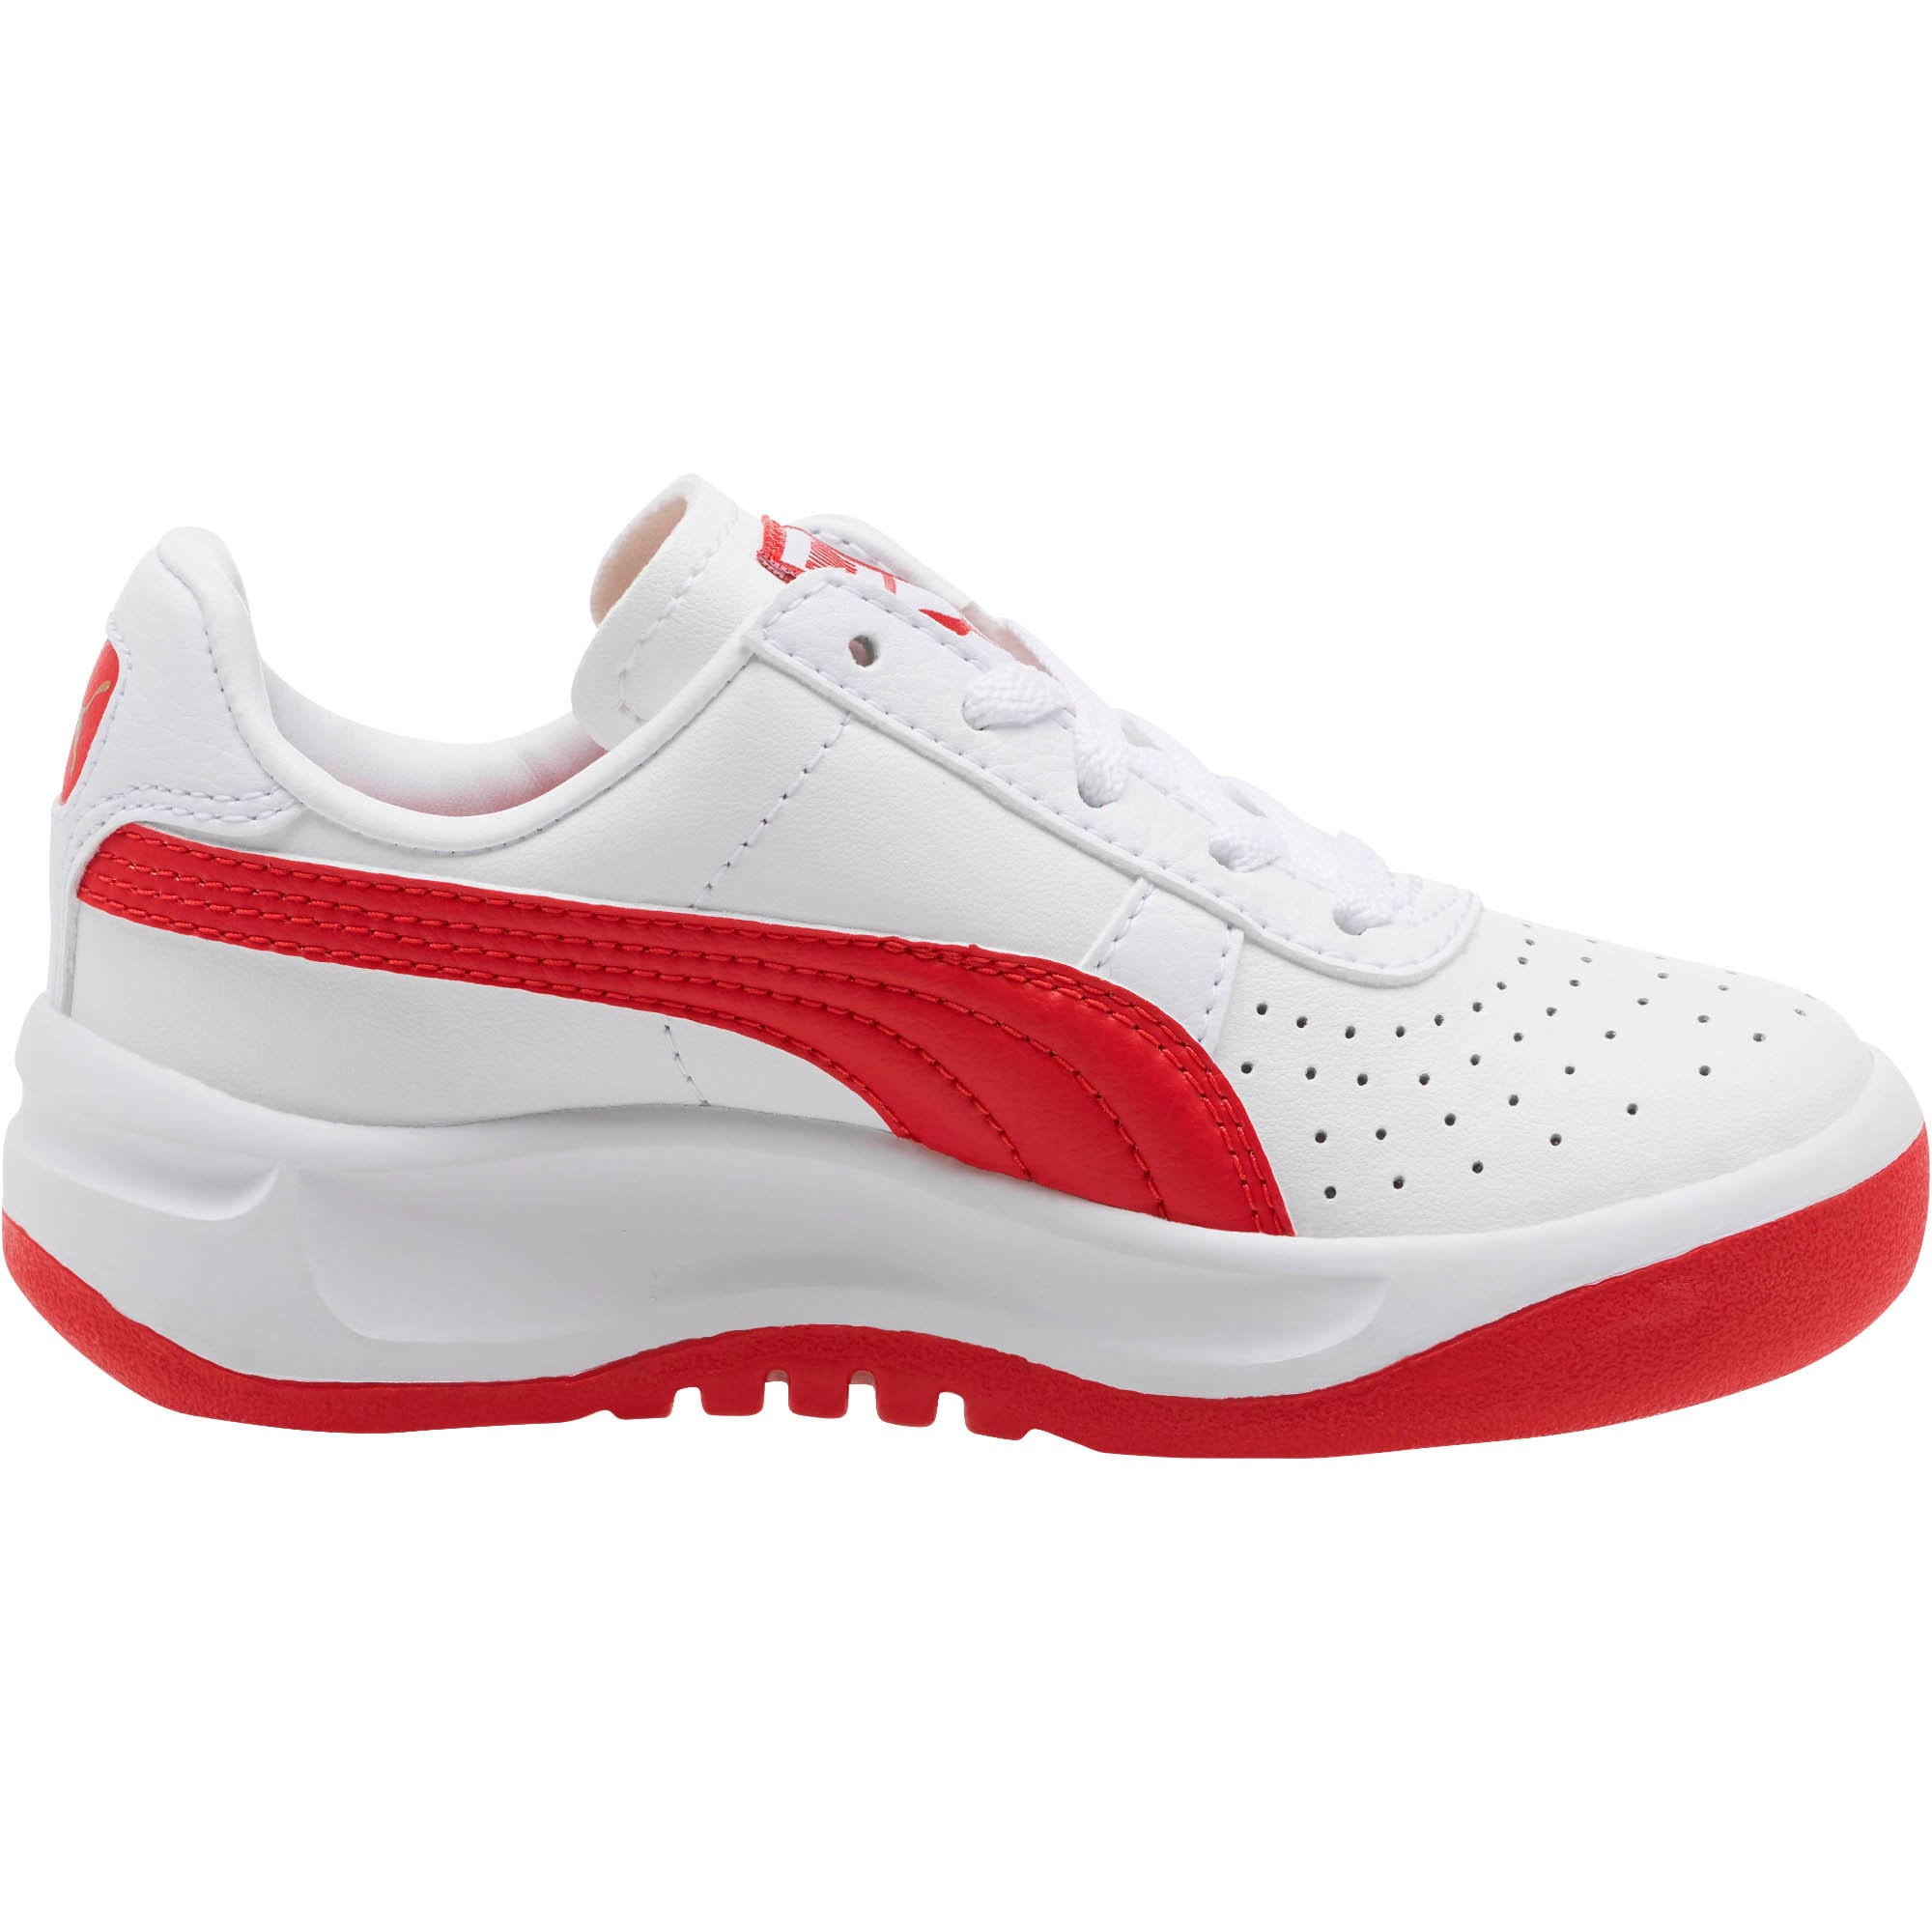 Thumbnail 3 of GV Special Little Kids' Shoes, Puma White-Ribbon Red, medium